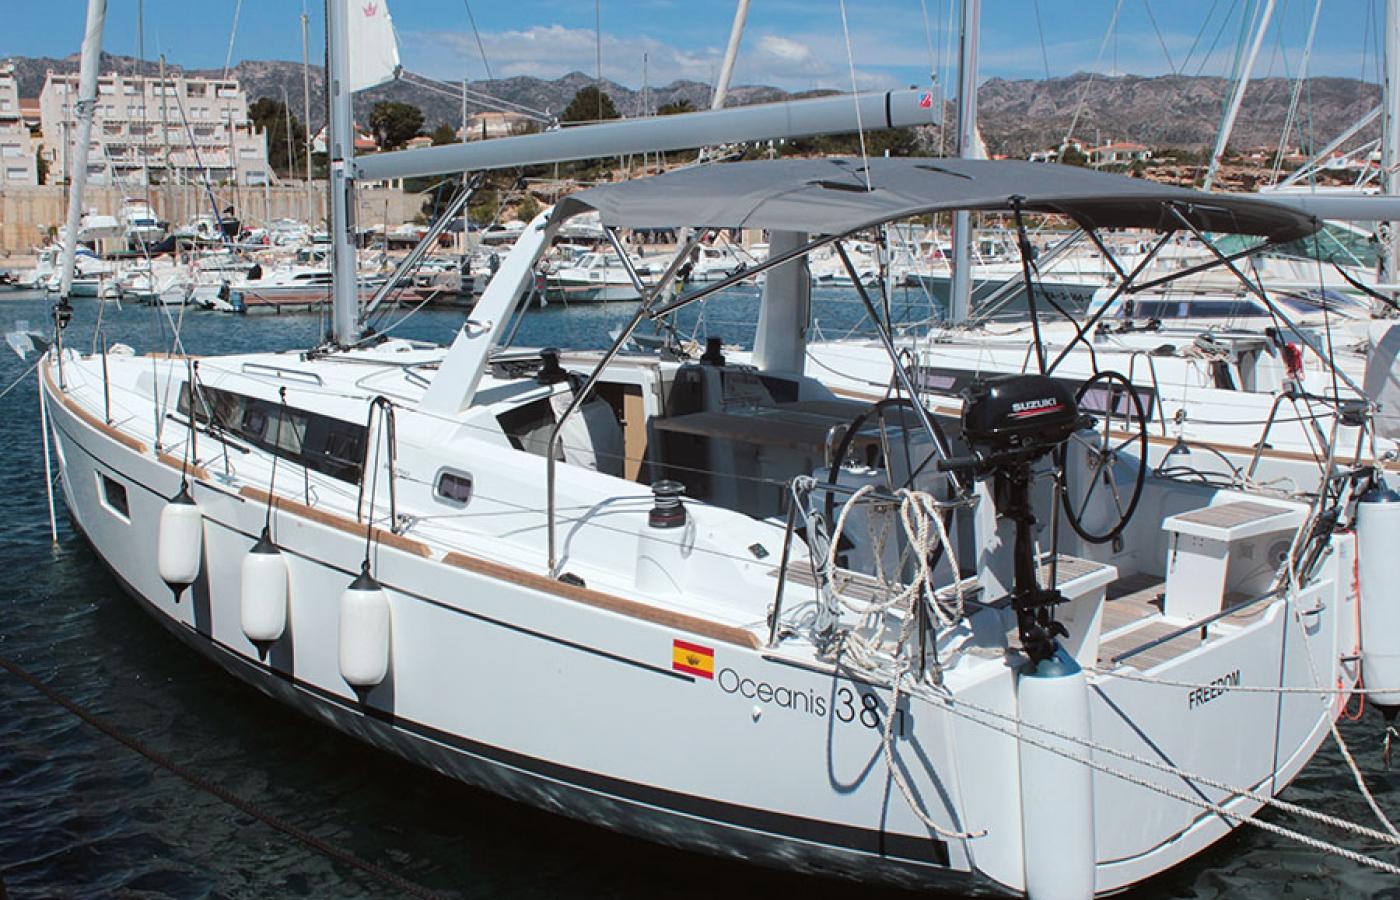 Beneteau Oceanis 38.1. FREEDOM yacht charter in Palma de Mallorca